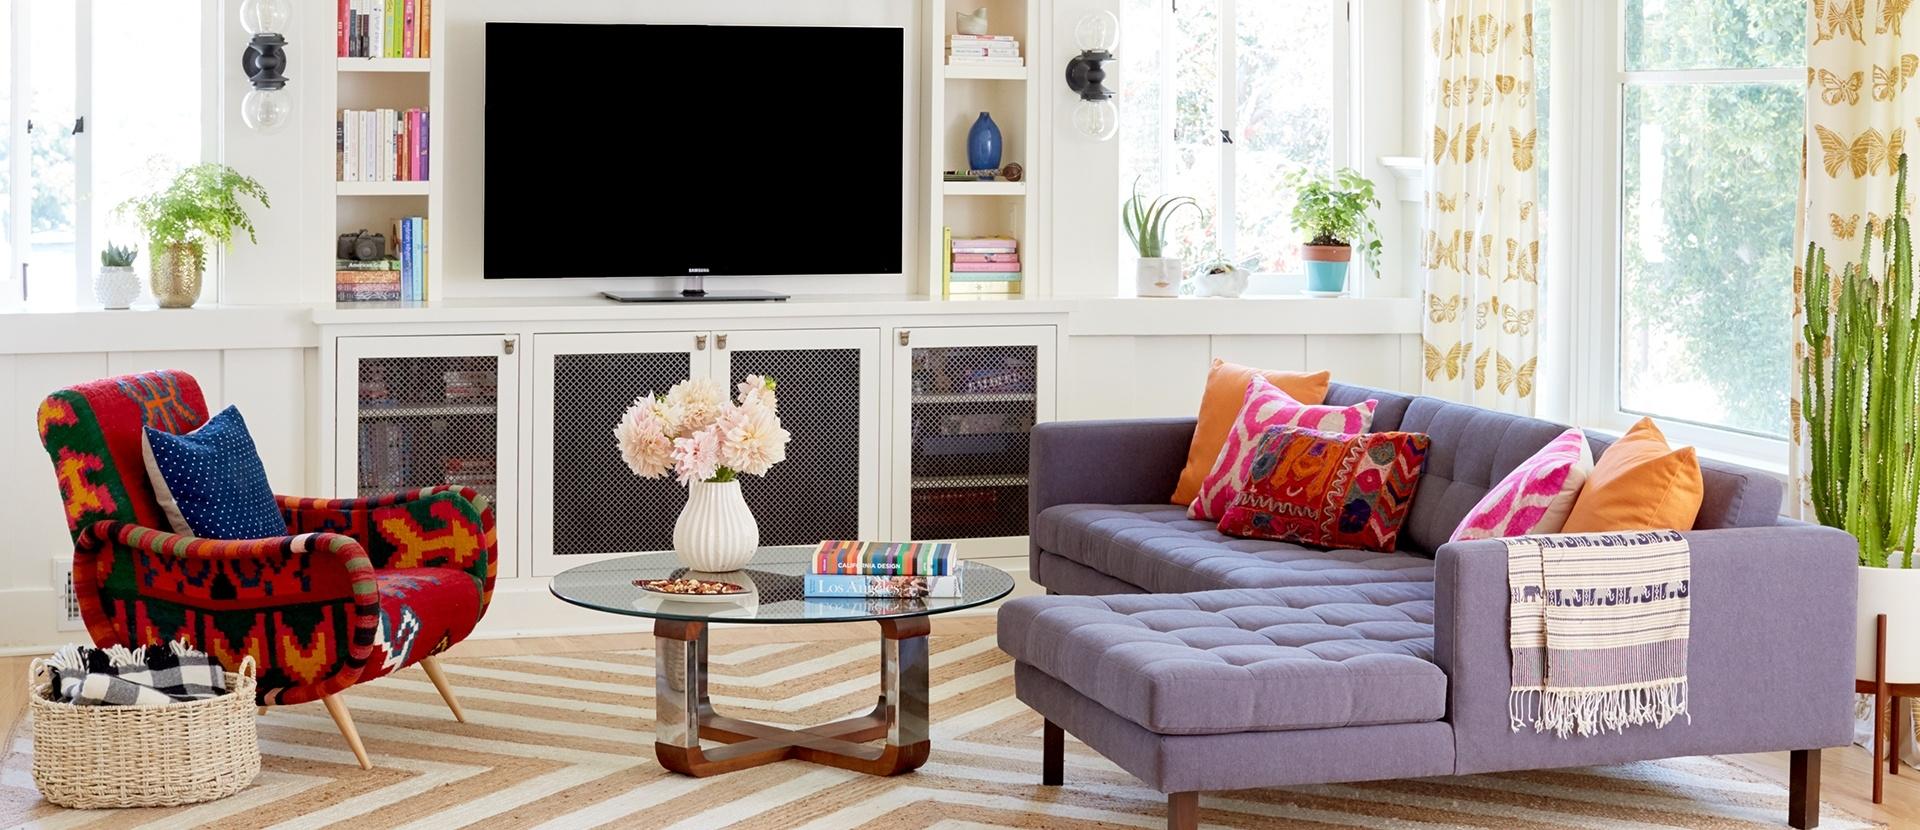 001-echo-park-living-room-hgtv-magazine-feature-anthropologie-kilim-chair-leila-los-angeles-modern-bohemian-bungalow-living-chevron-orange-rug-built-in-media-center-rejuvenation-lighting